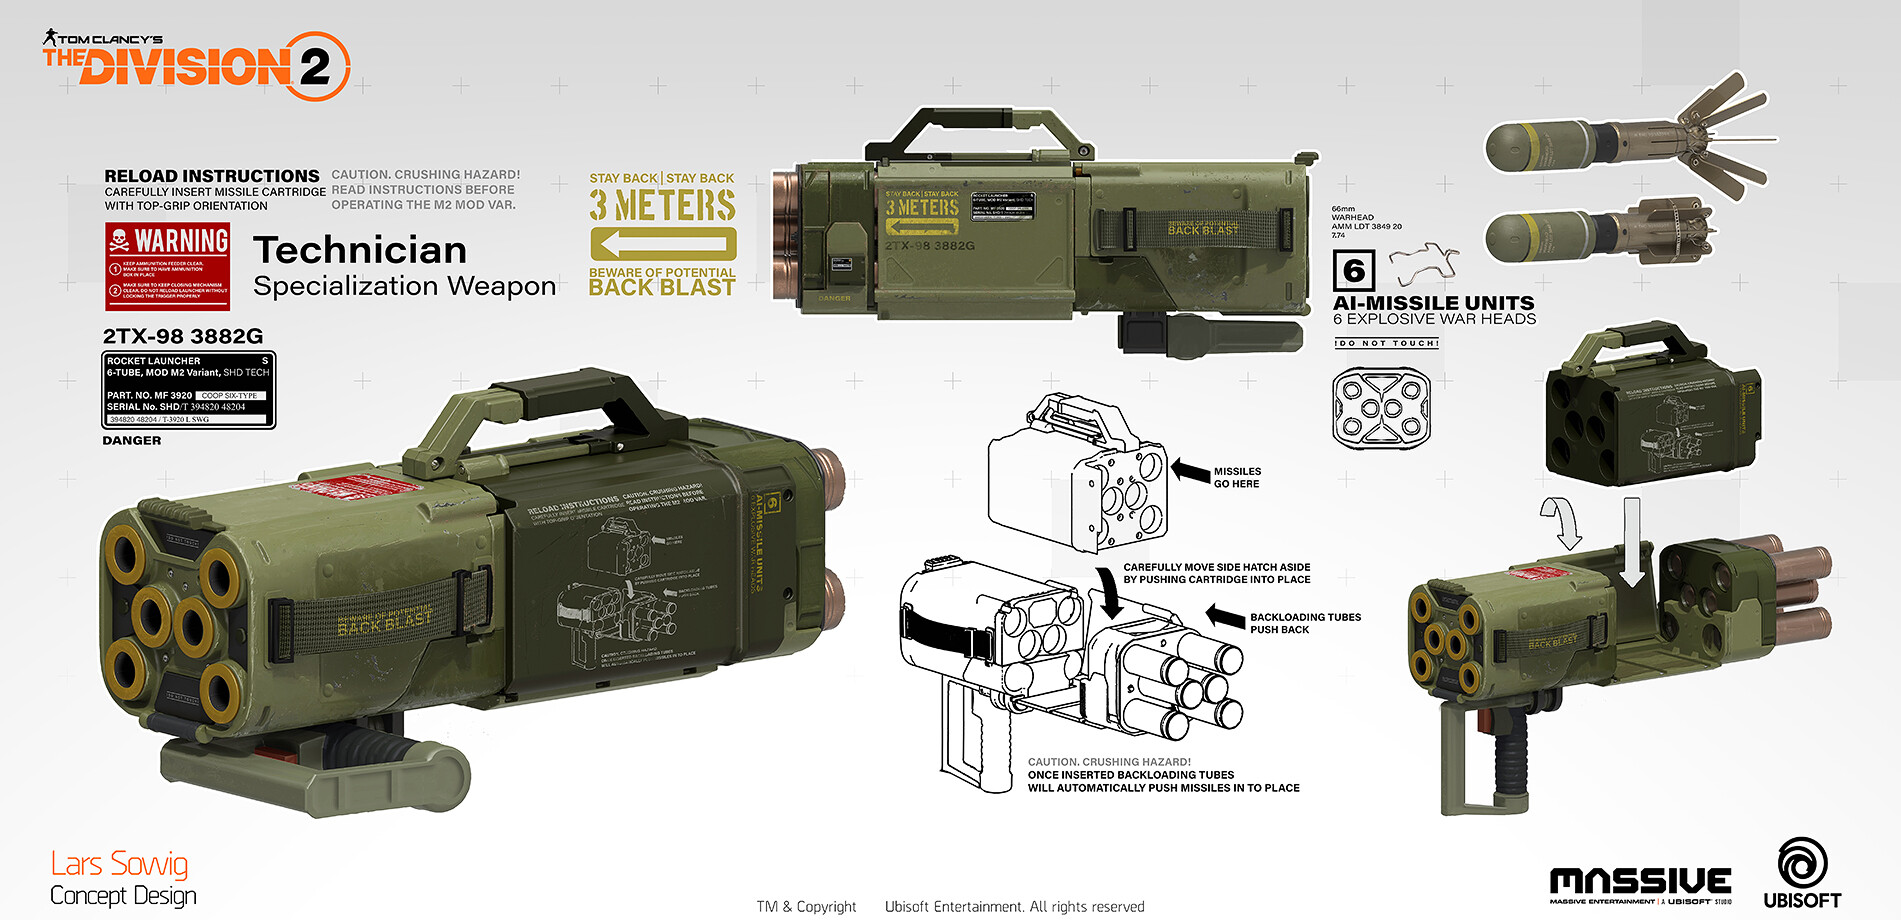 Lars sowig lars sowig 0067 missile launcher 2